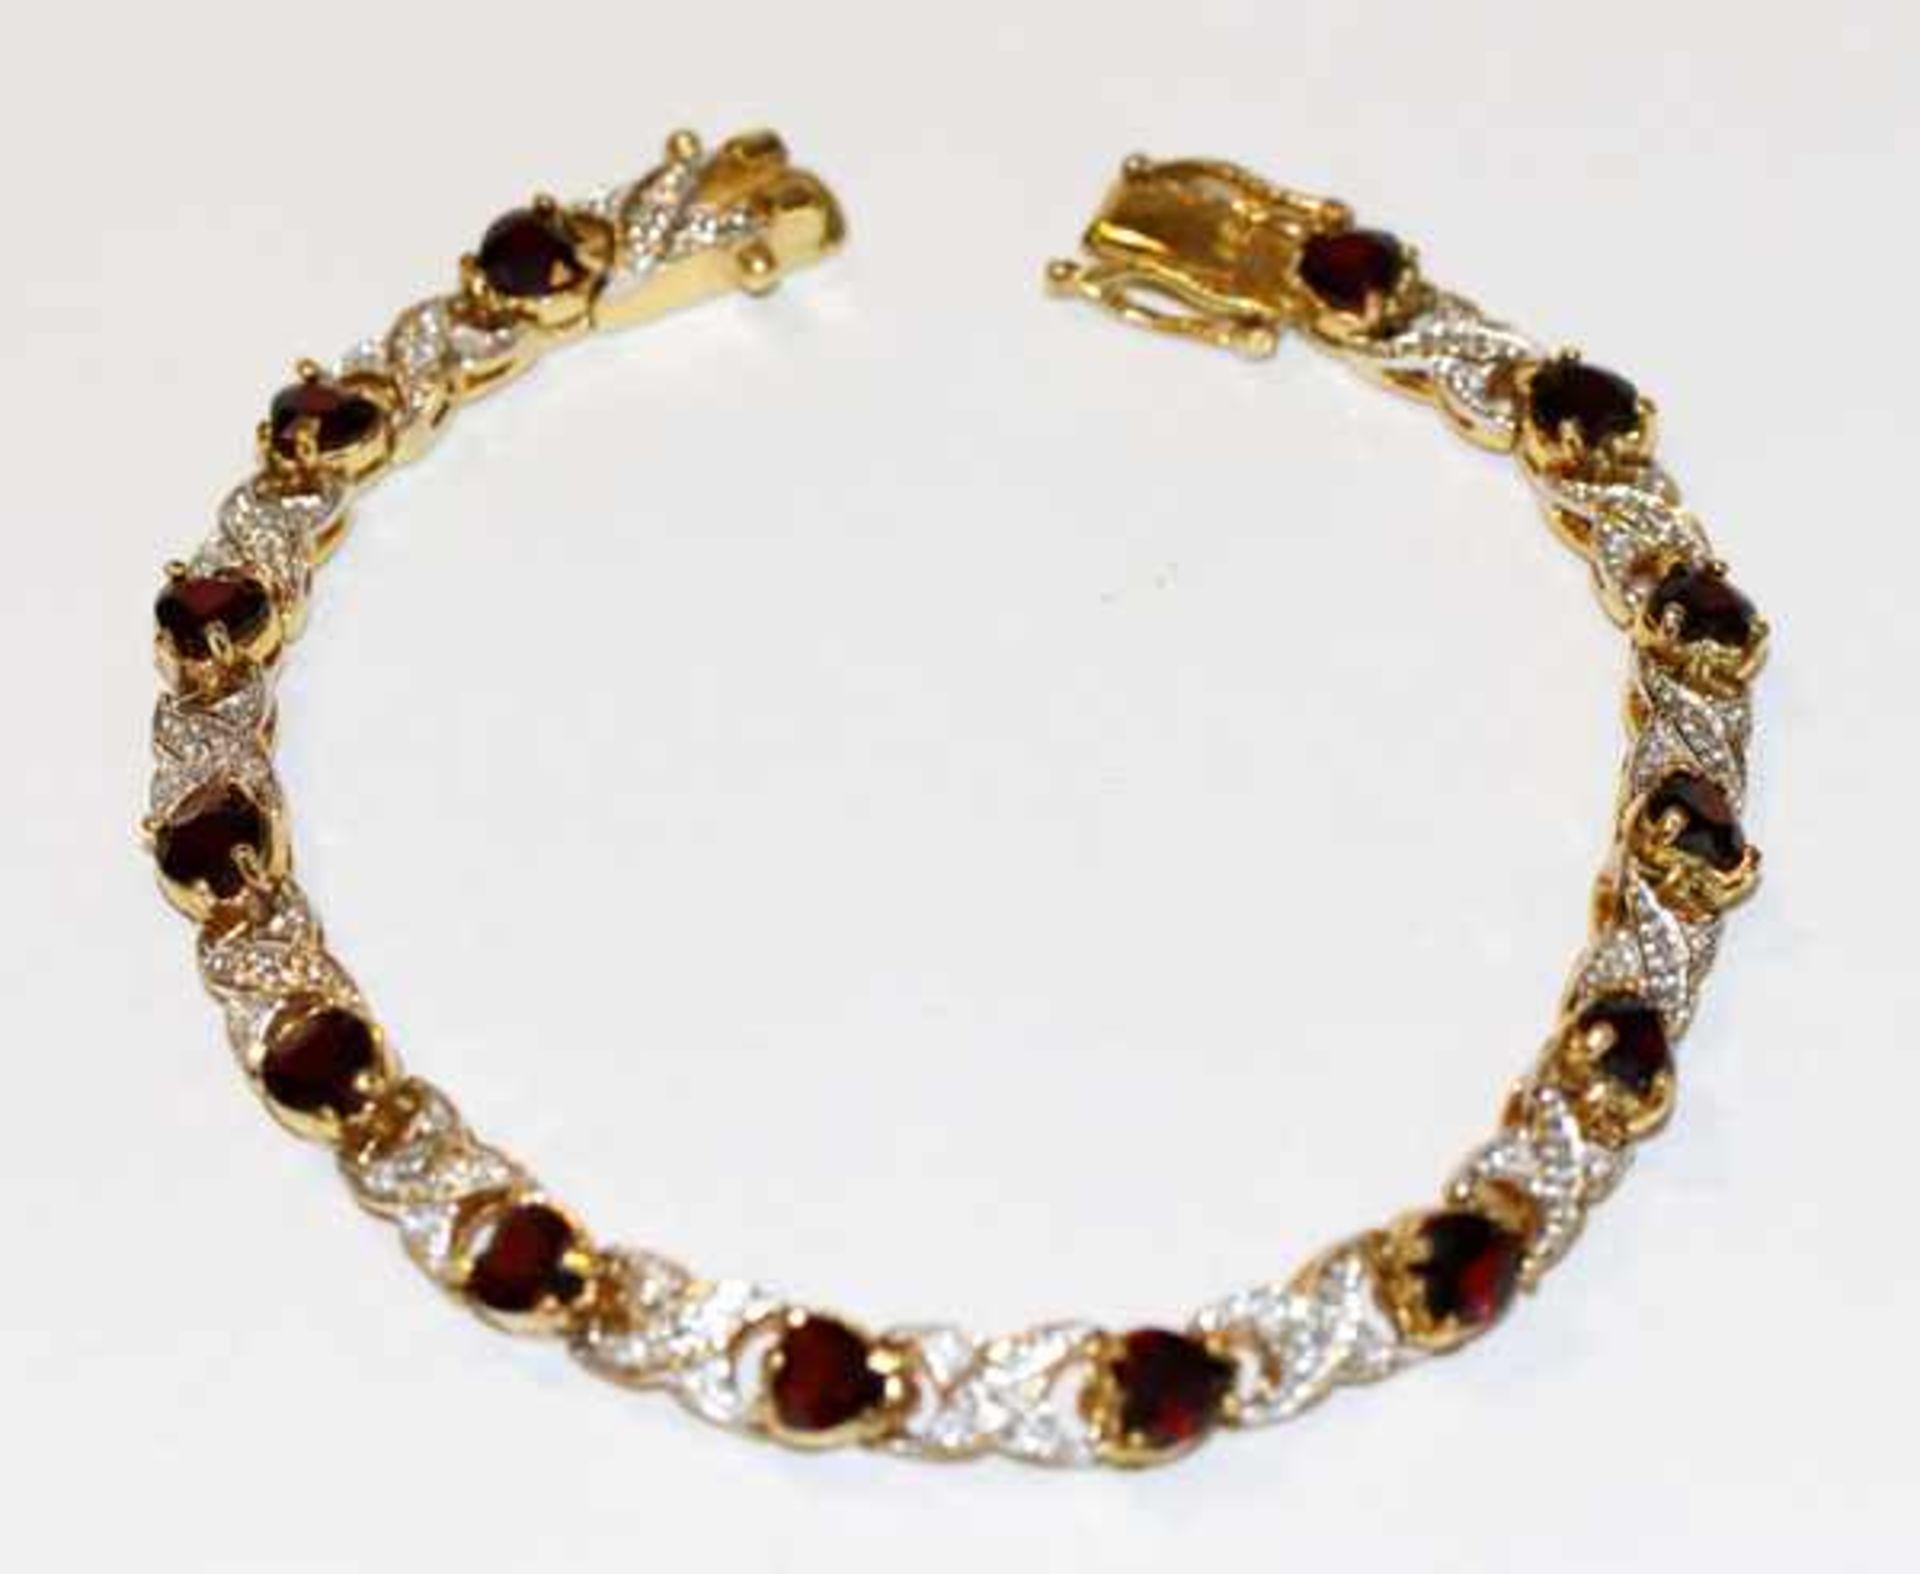 Los 19 - Sterlingsilber/vergoldetes Armband mit Glassteinen besetzt, L 20 cm